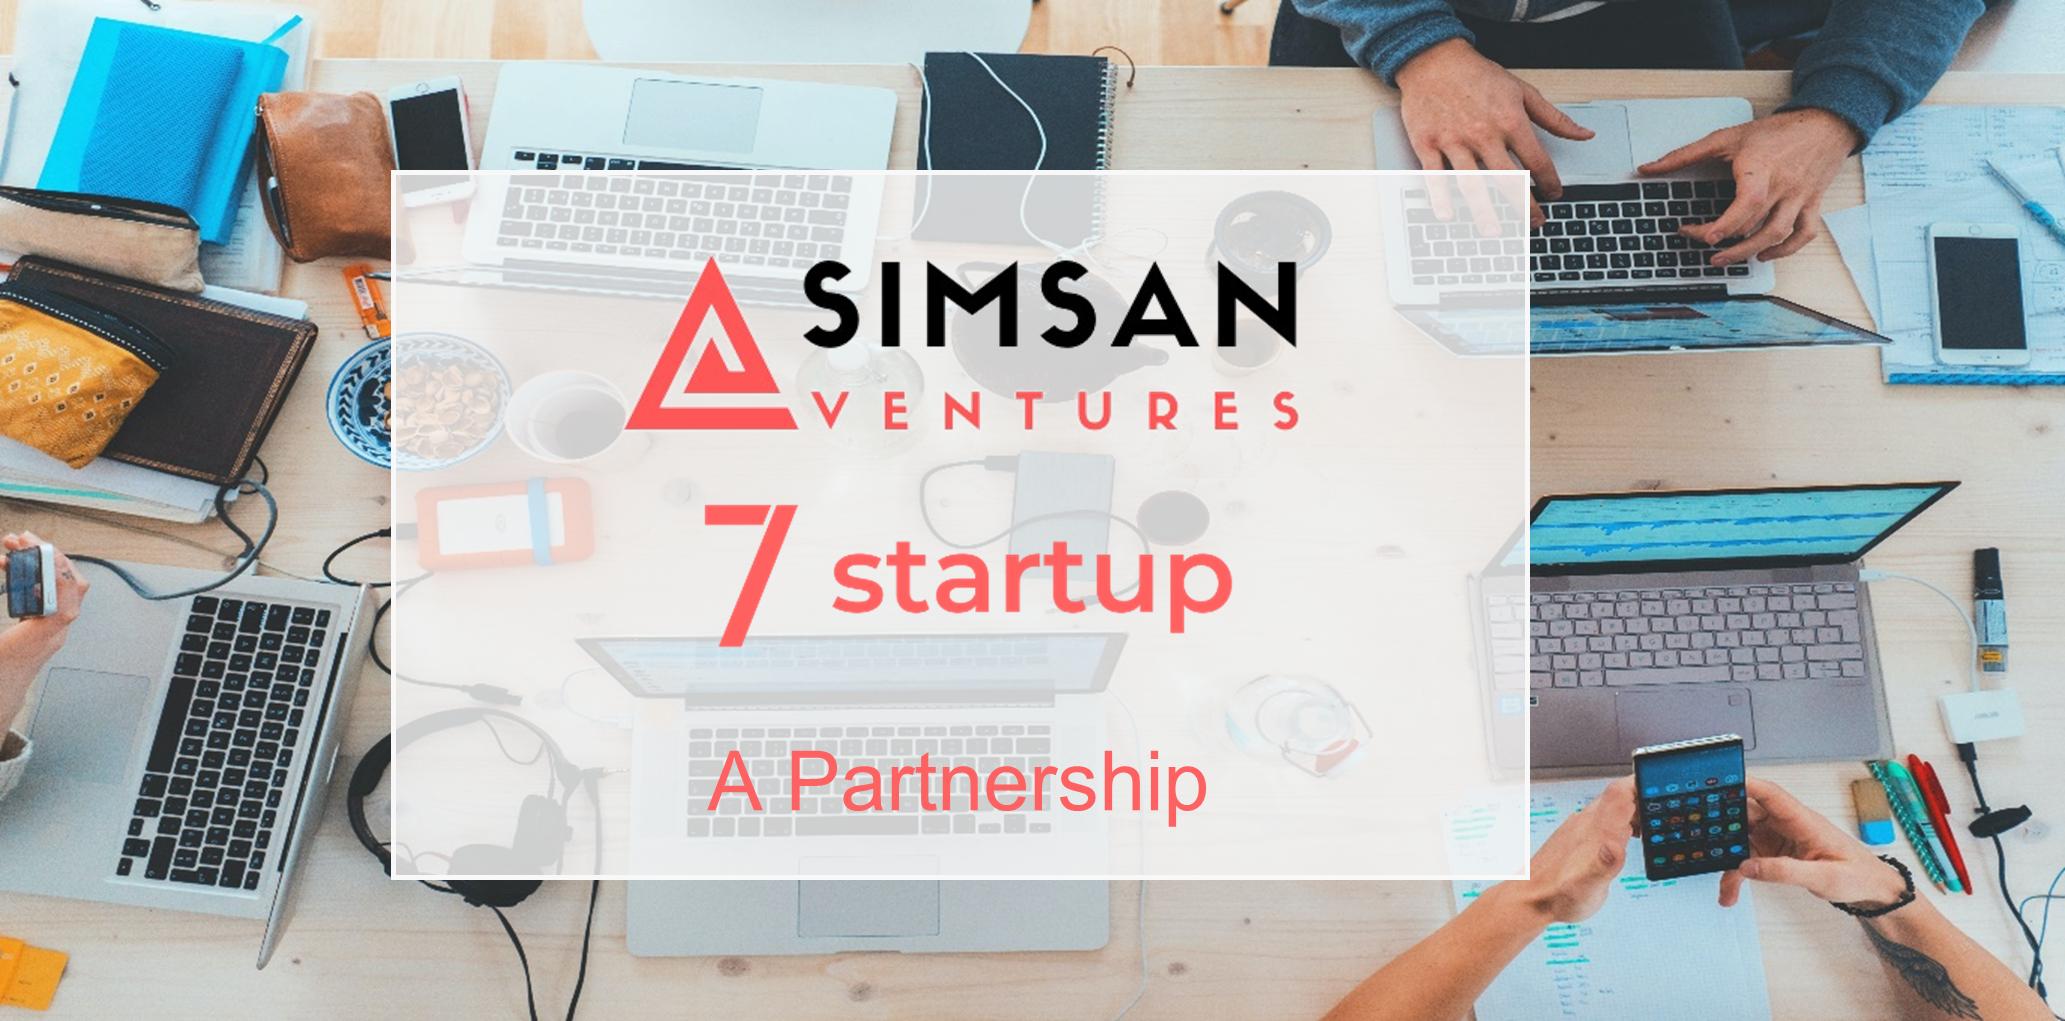 Simsan Ventures and 7startup - a partnership